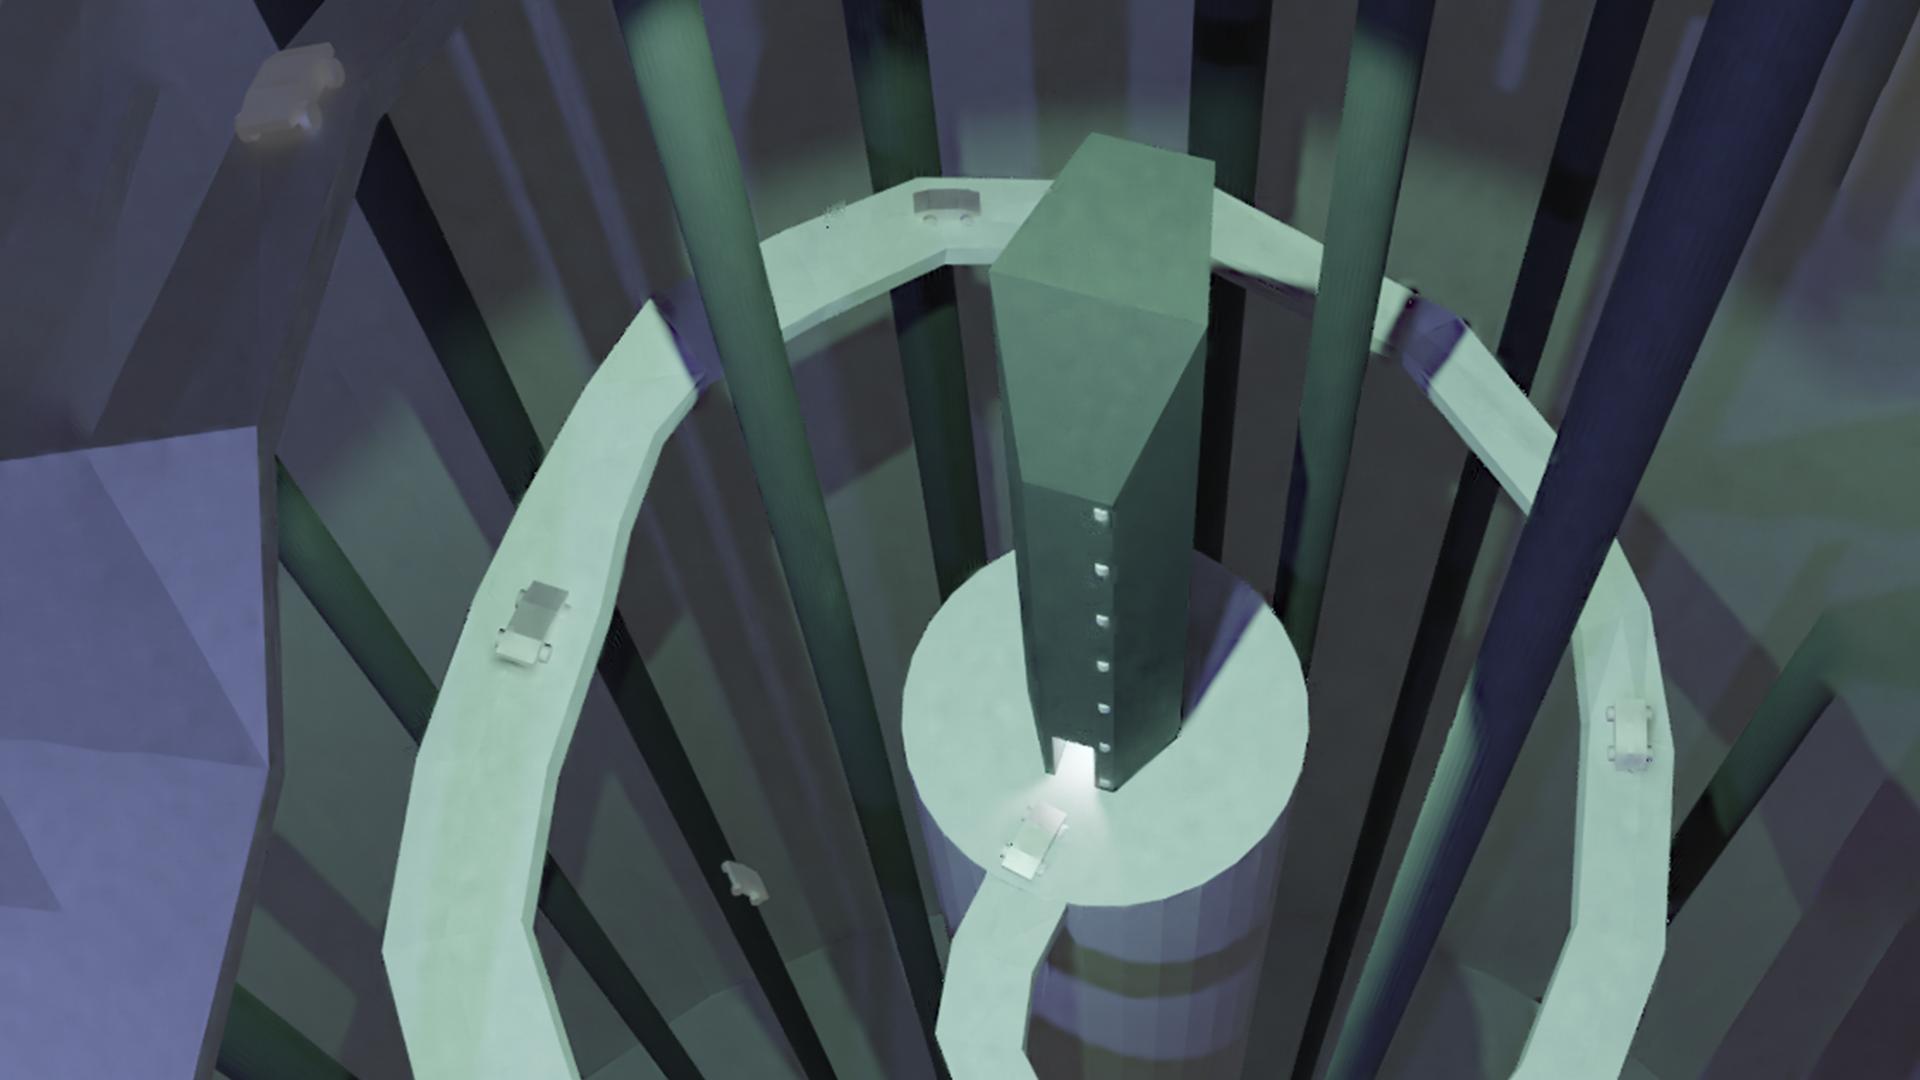 The Monolith supercomputer